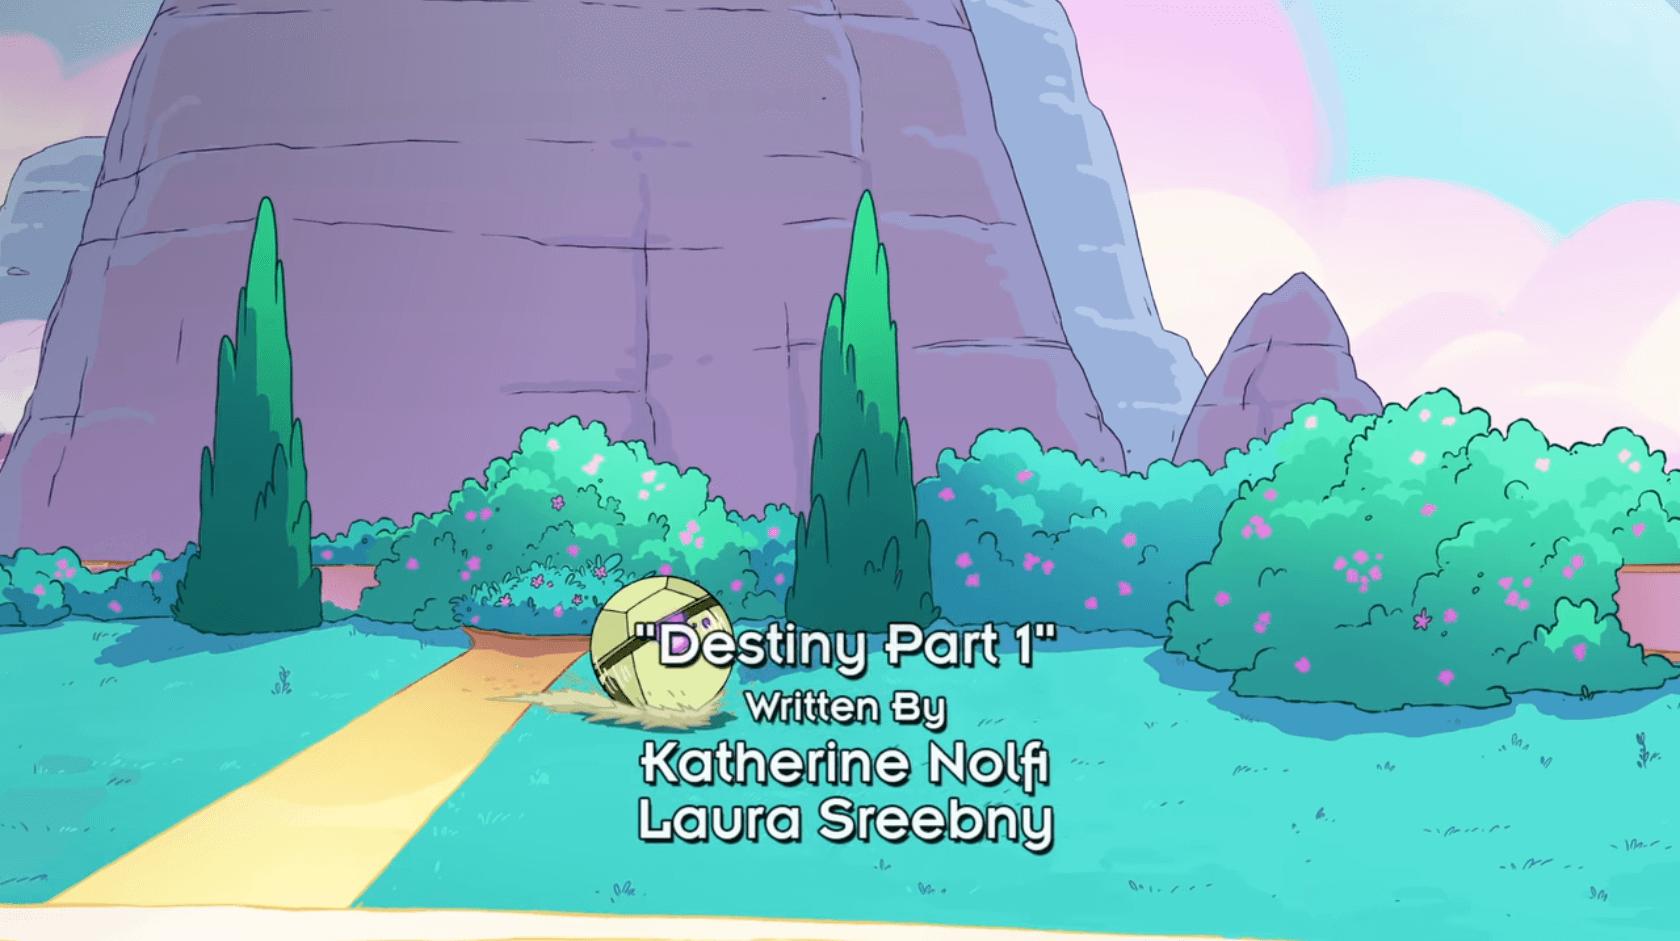 Destiny Part 1